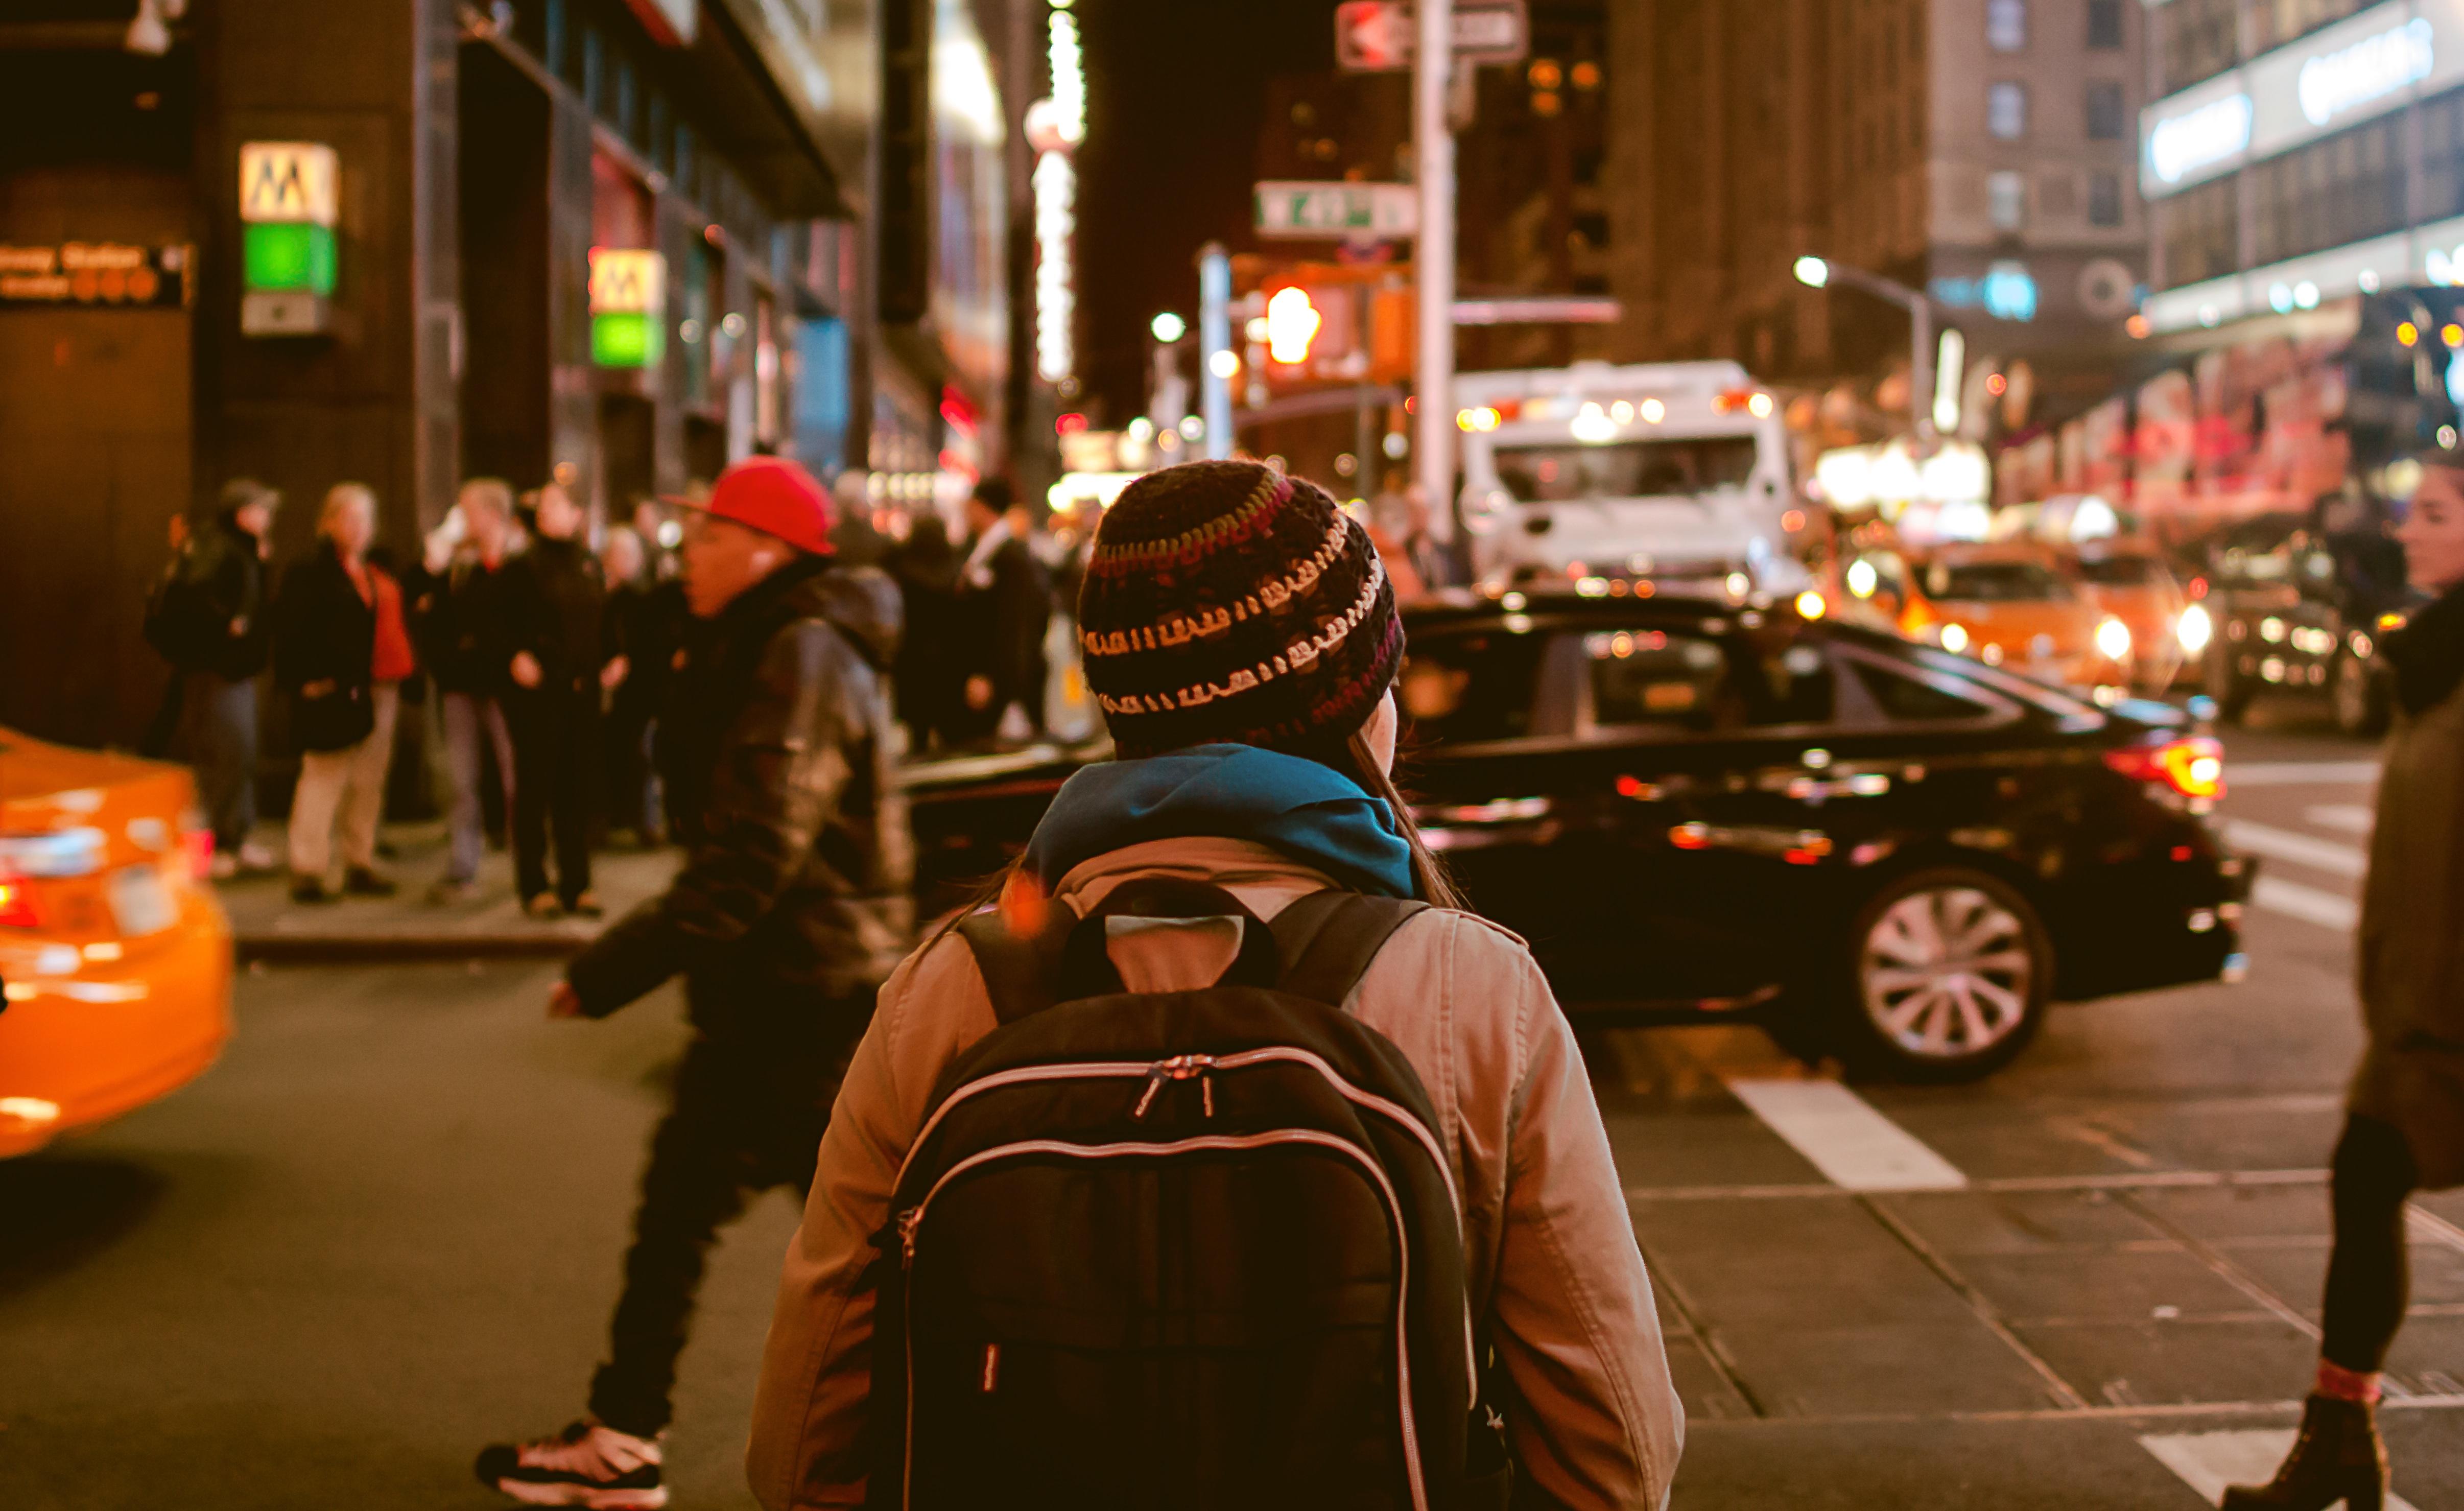 Города и люди фото